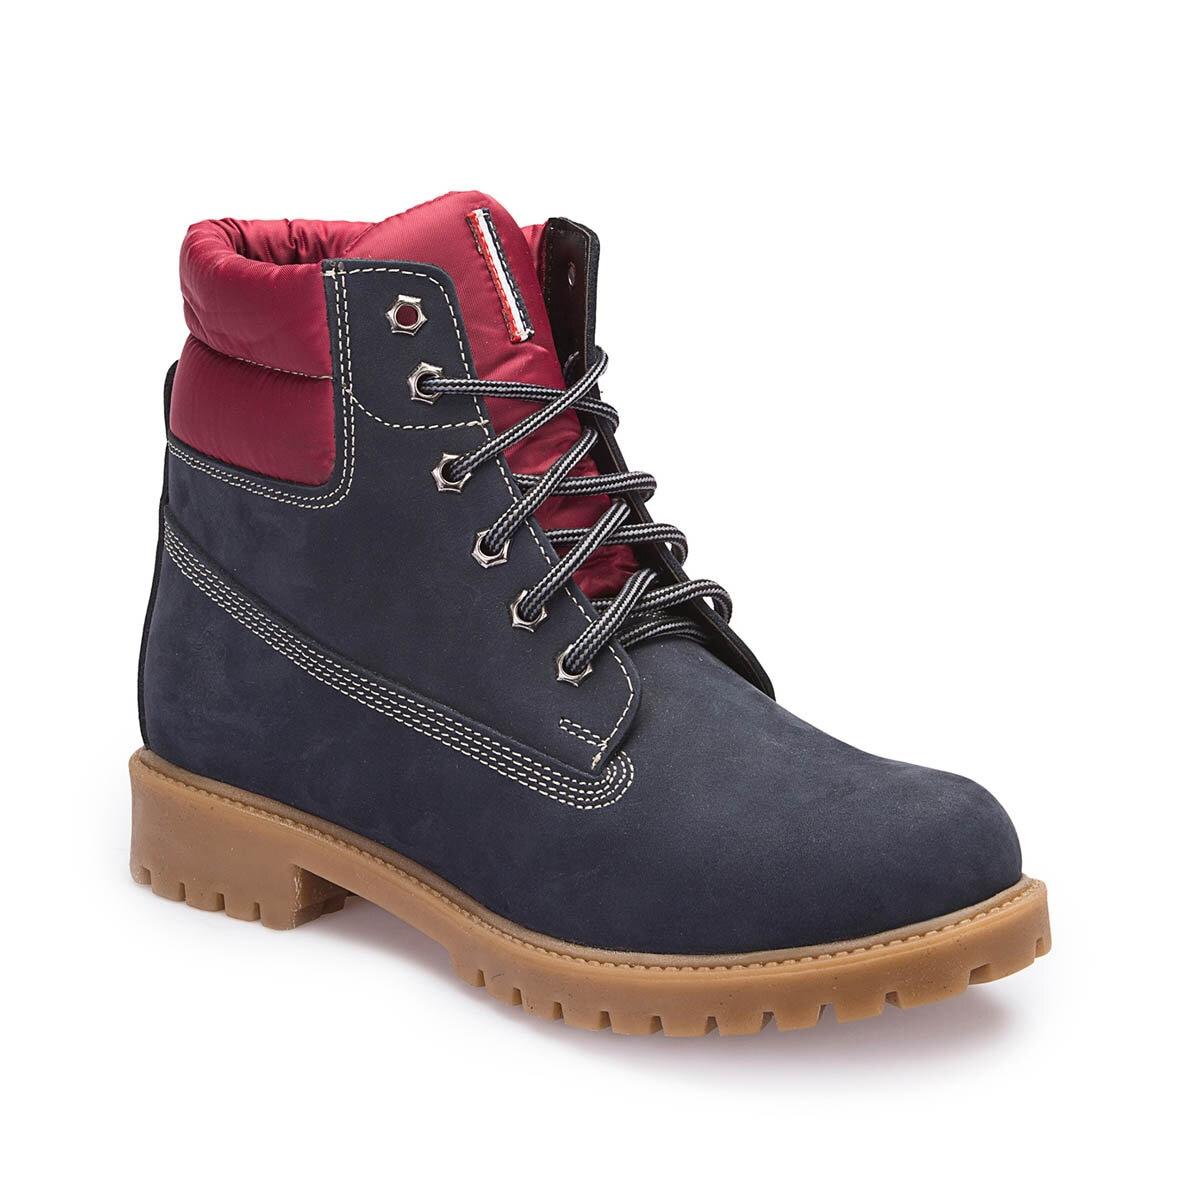 FLO A3376988 Navy Blue Men 'S Boots U.S. POLO ASSN.